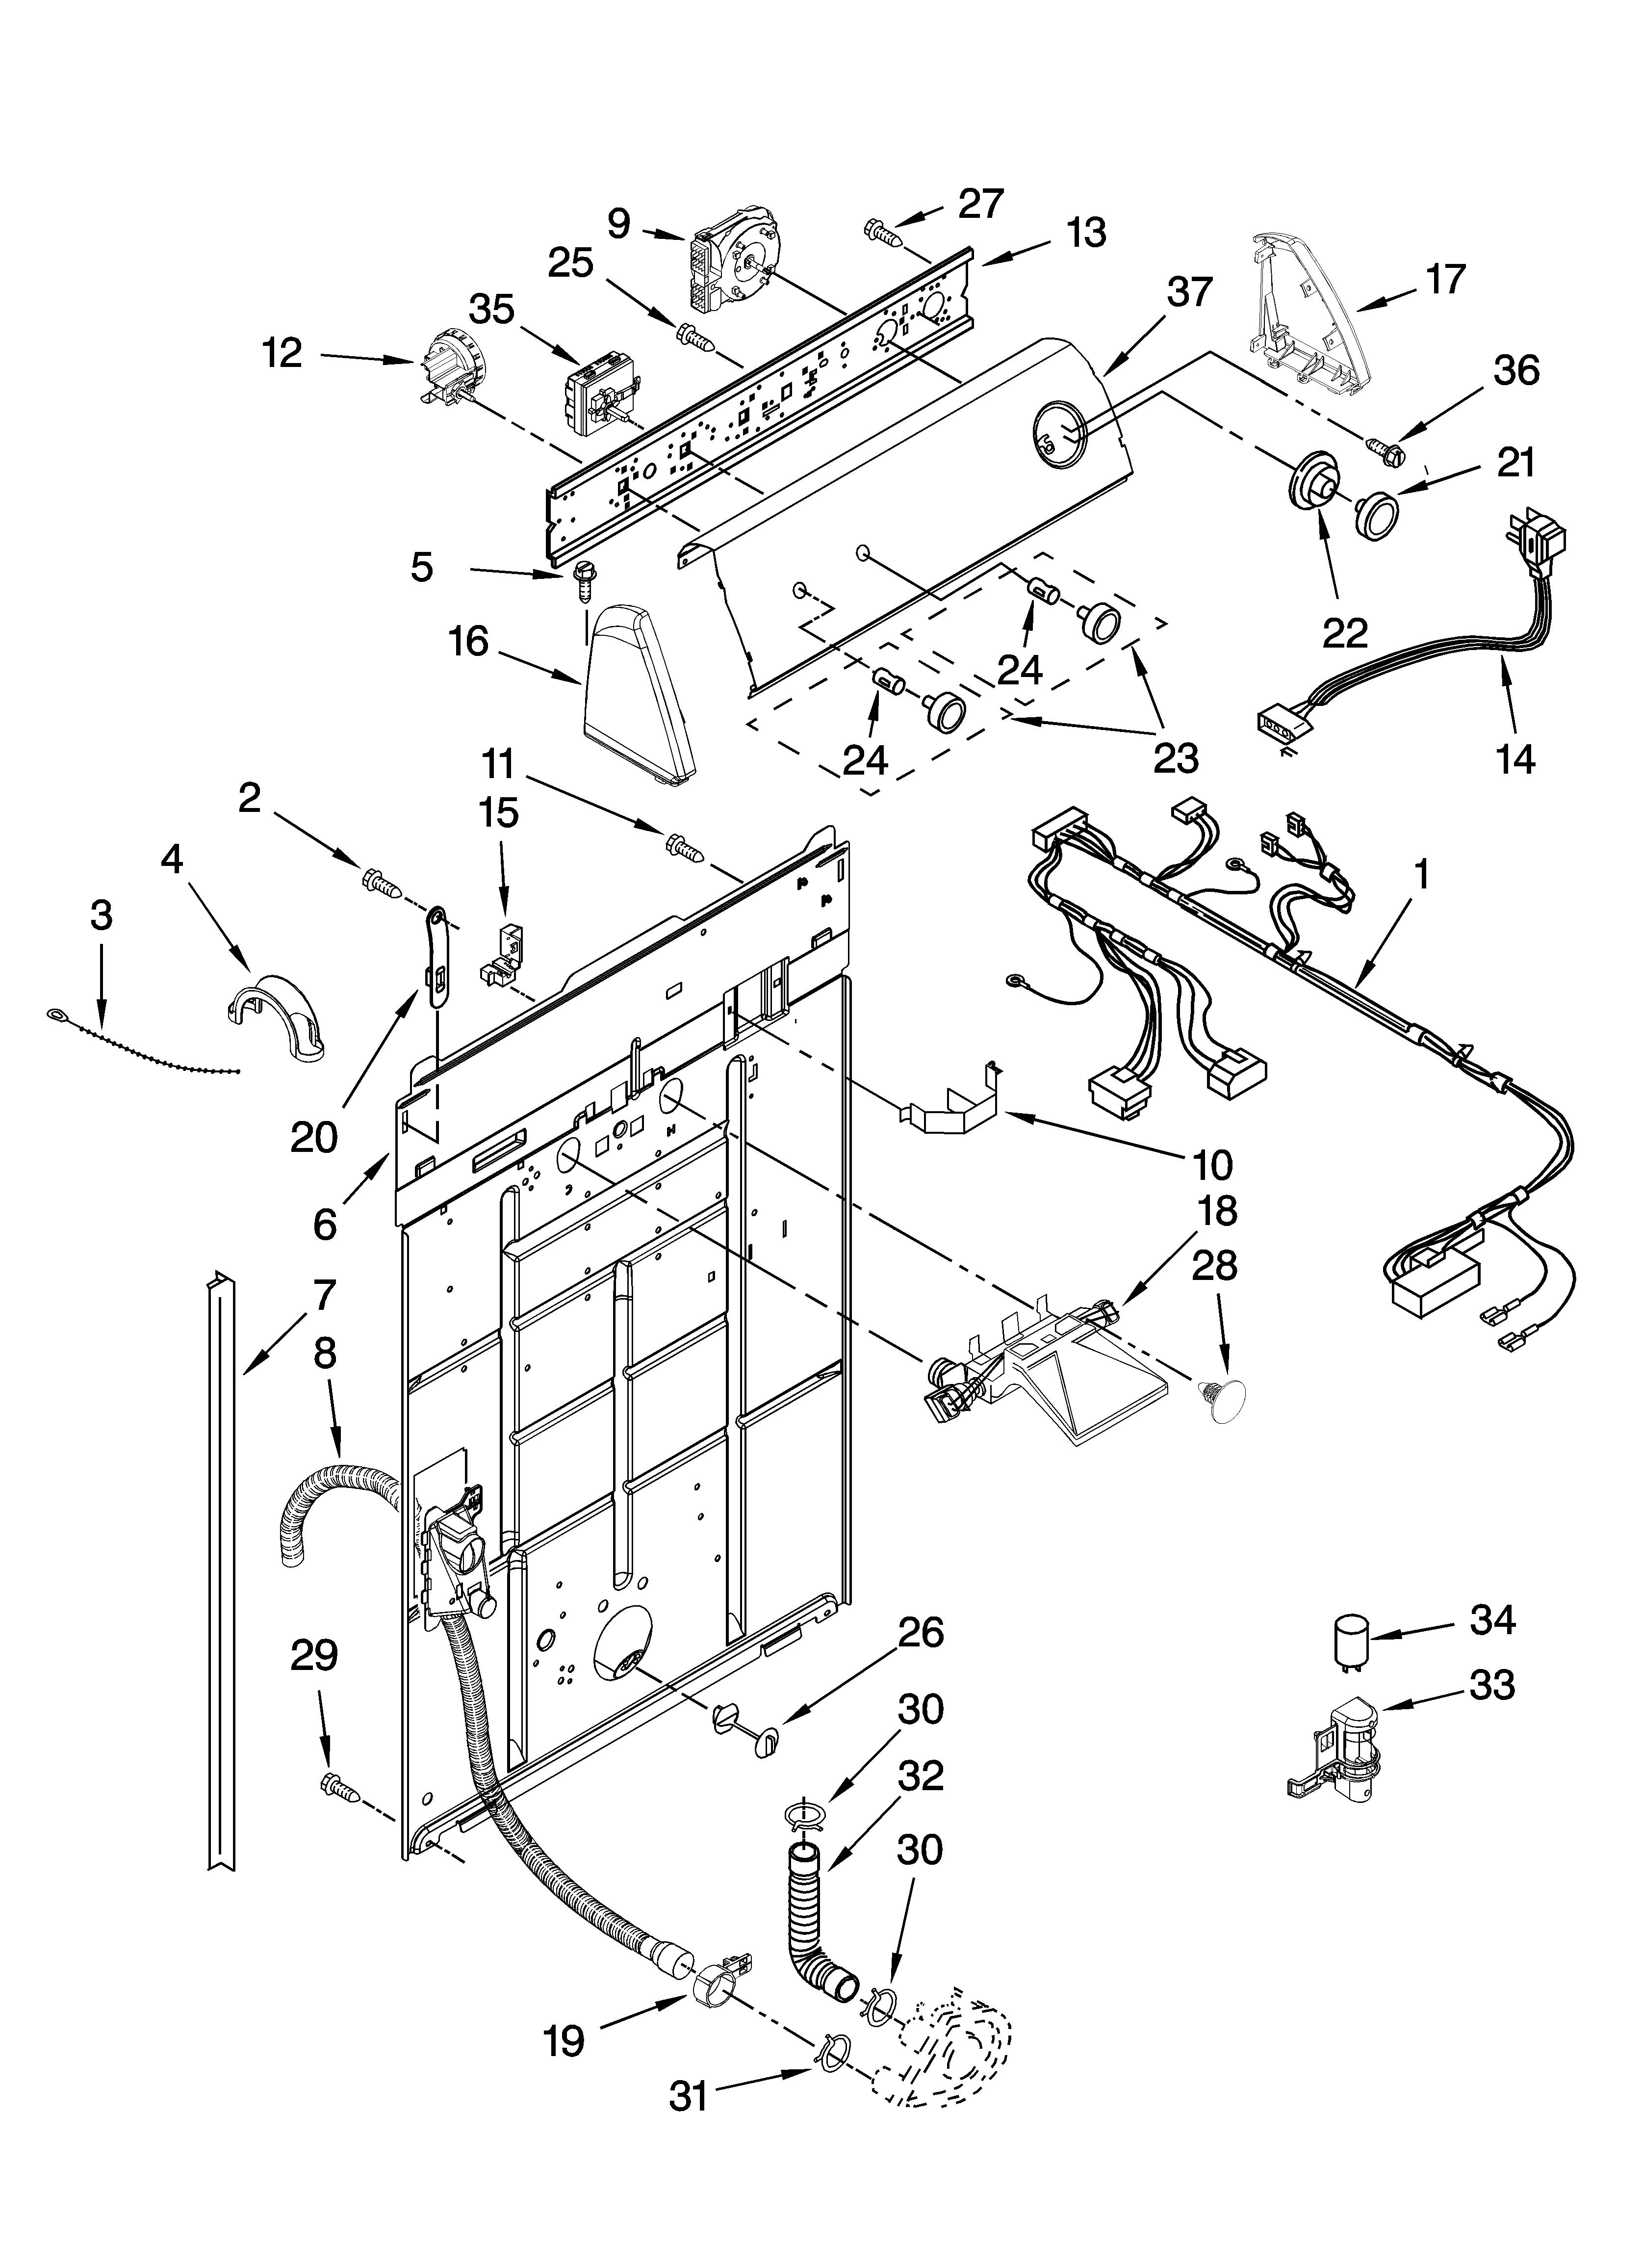 Admiral Washing Machine Wiring Diagram - V8 Engine Firing Order Diagram -  ad6e6.sehidup.jeanjaures37.fr | Admiral Washer Wiring Diagram |  | Wiring Diagram Resource